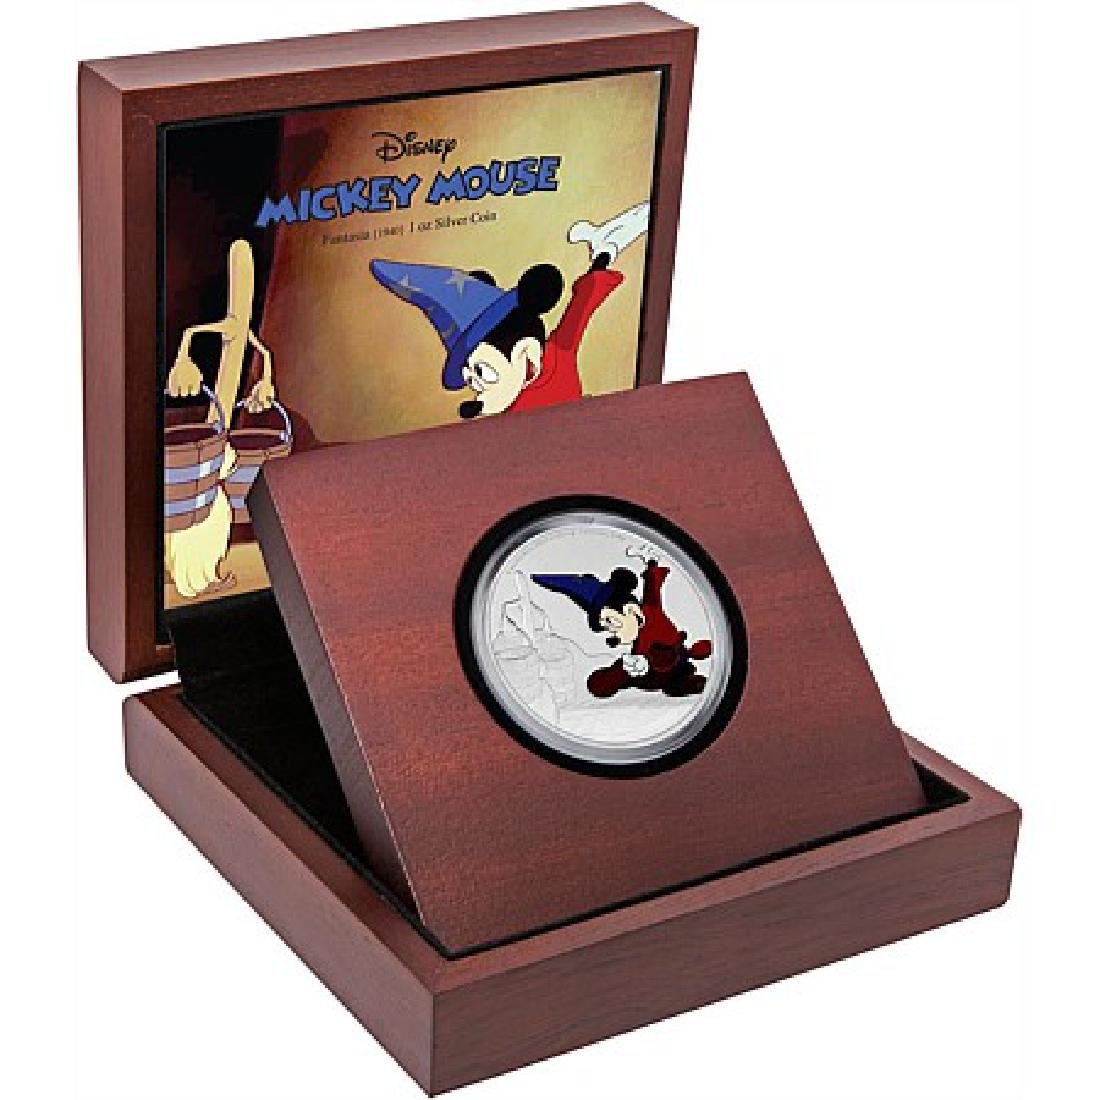 2017 1 oz Silver $2 Mickey Through the Ages: Fantasia - 3